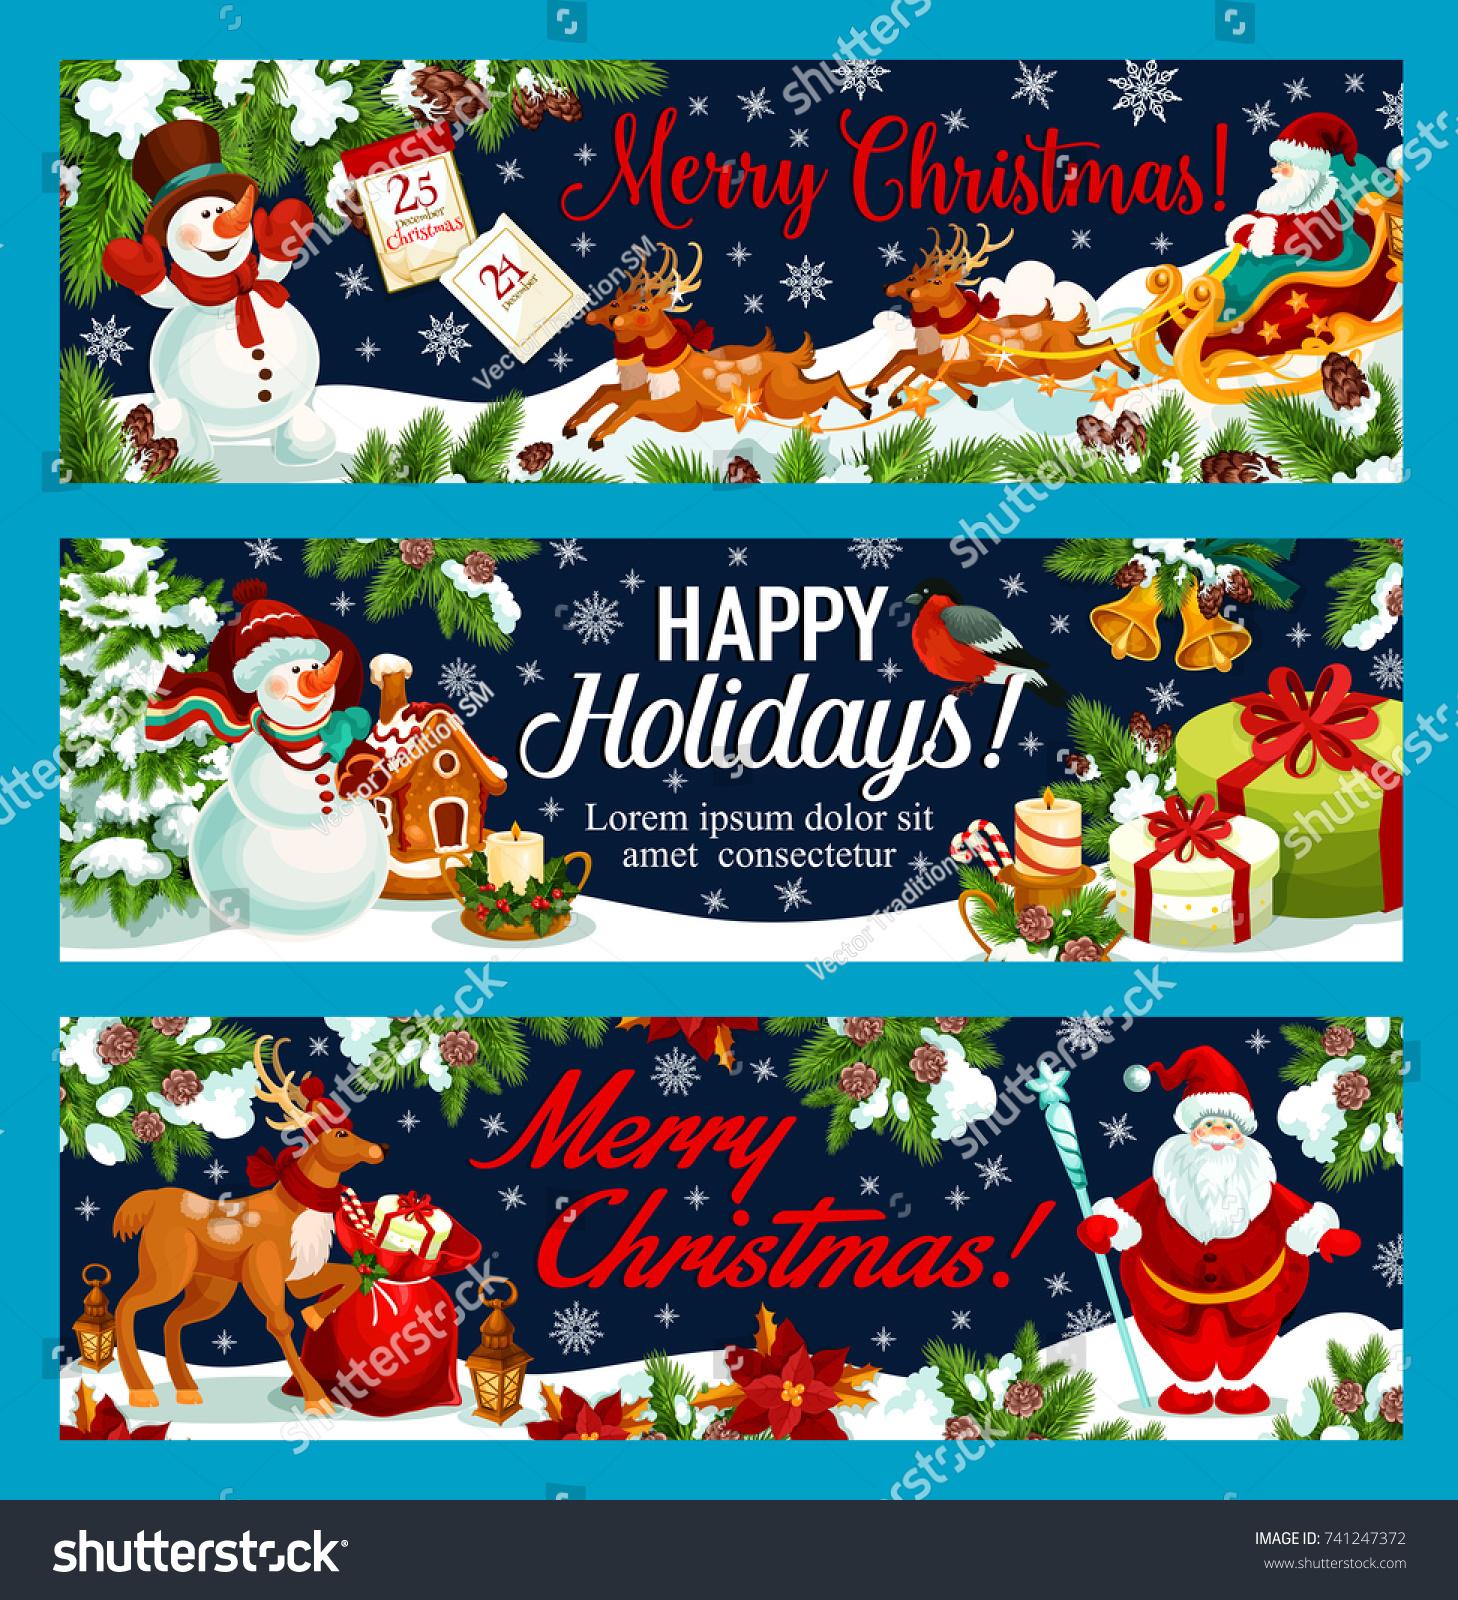 Merry christmas happy holidays greeting banners stock vector merry christmas and happy holidays greeting banners for new year winter holiday wish vector santa kristyandbryce Gallery